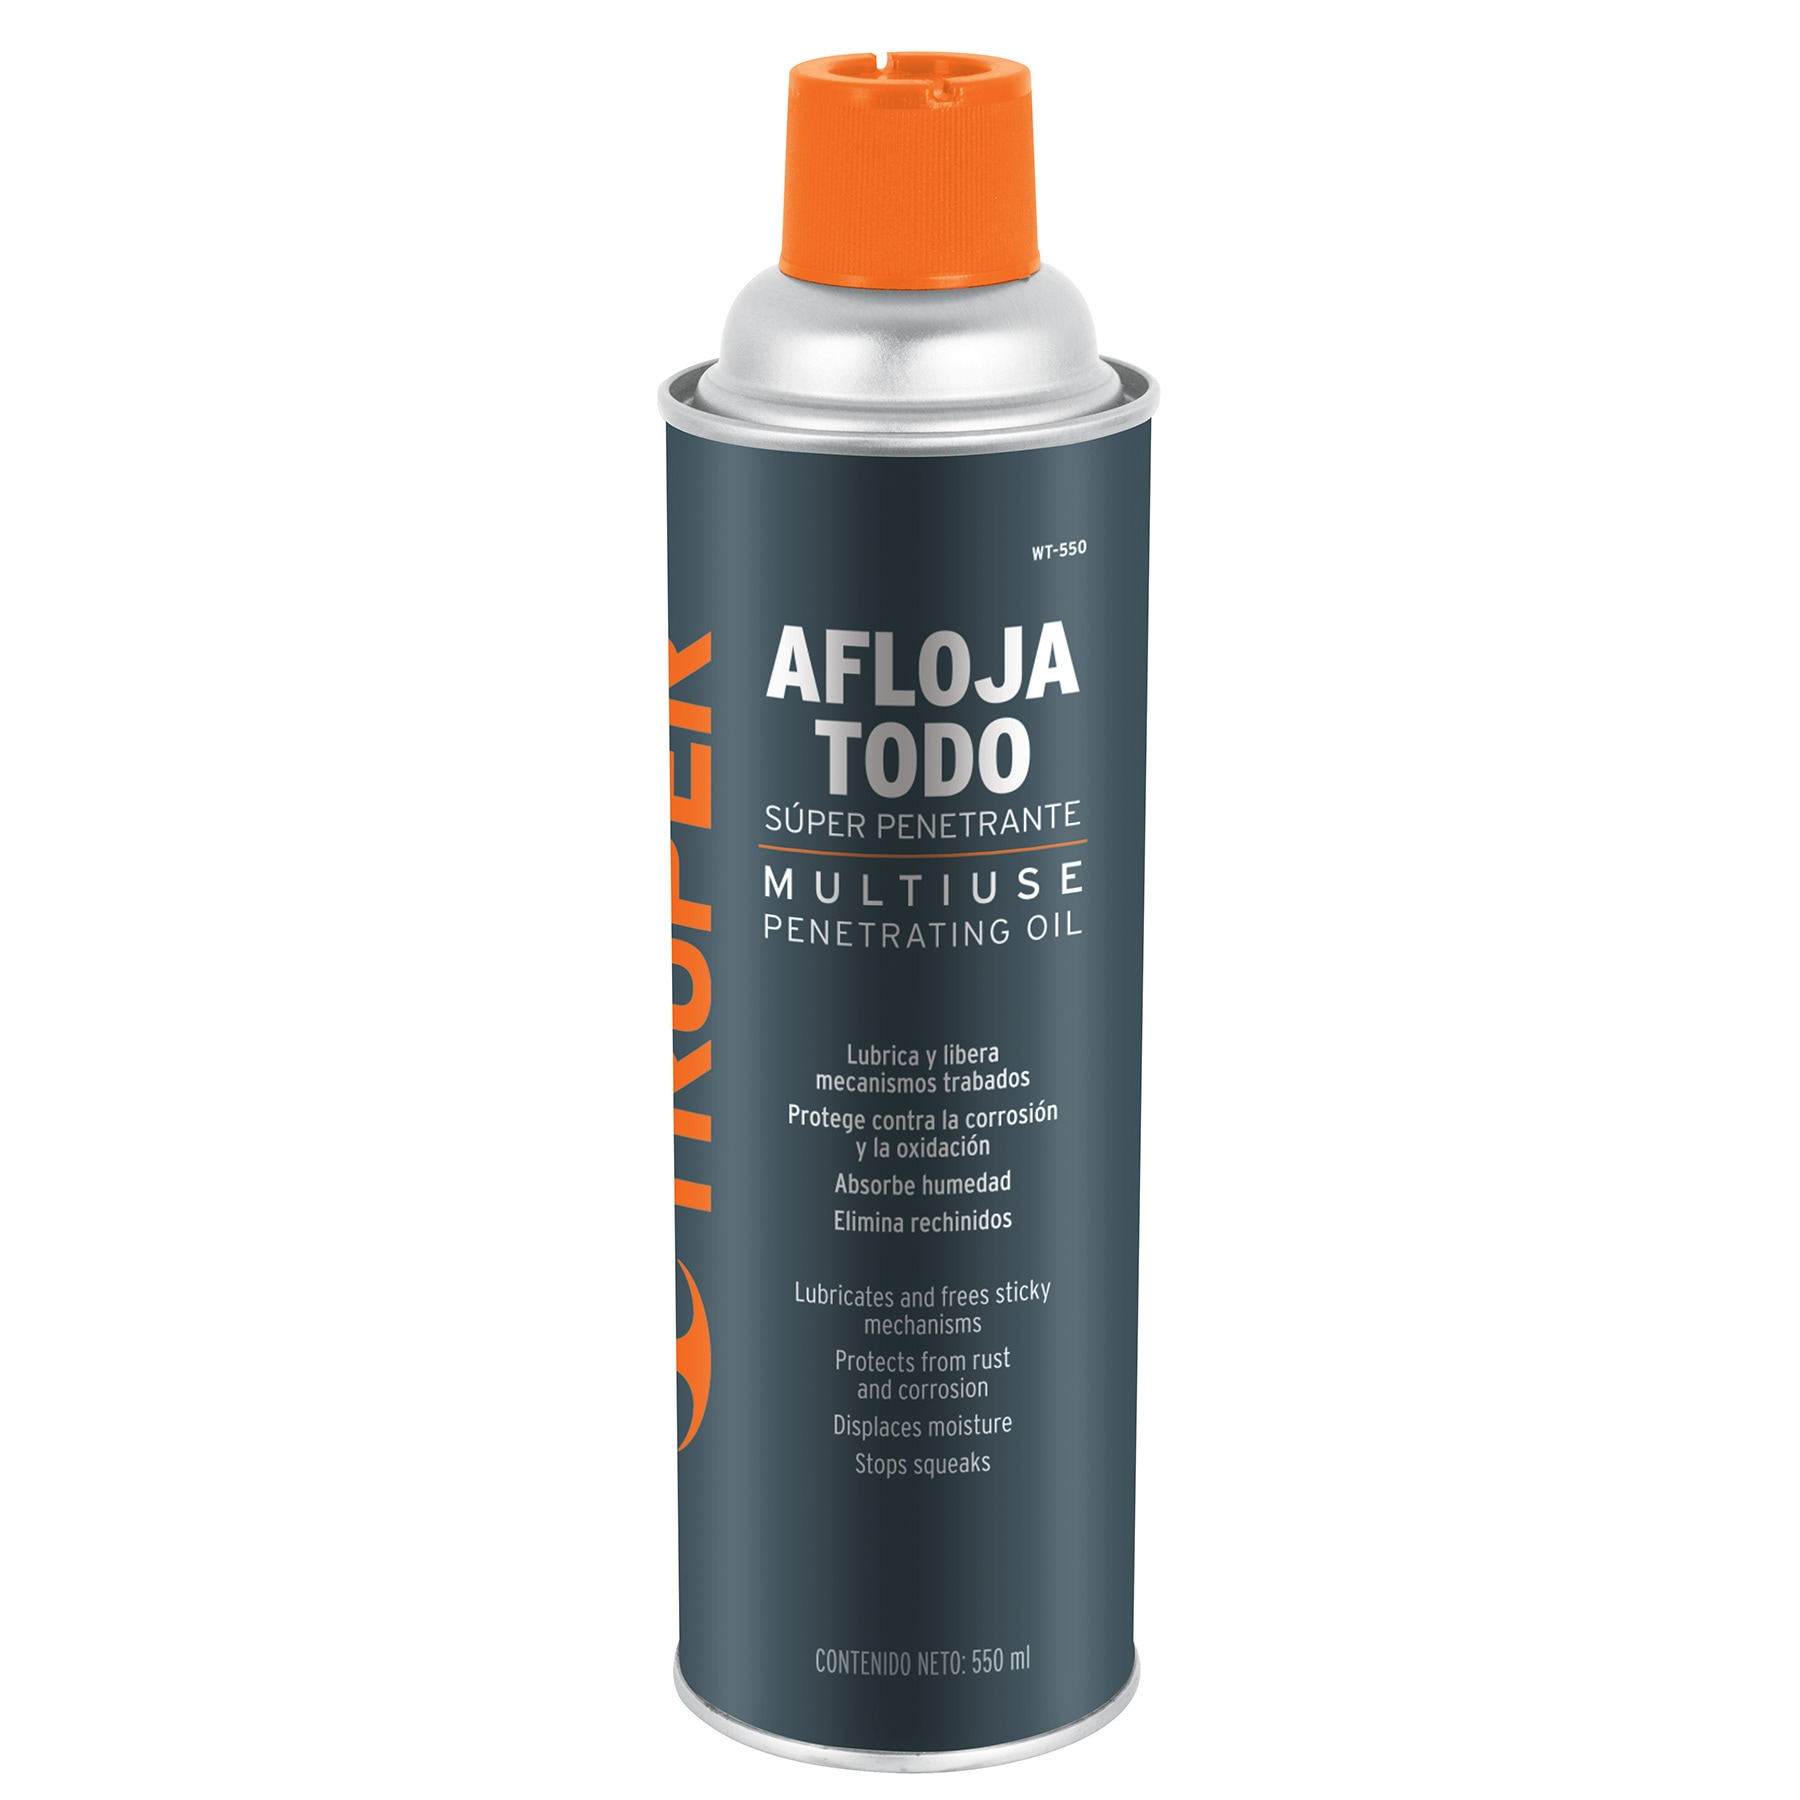 Aceite aflojatodo en aerosol, 550 ml